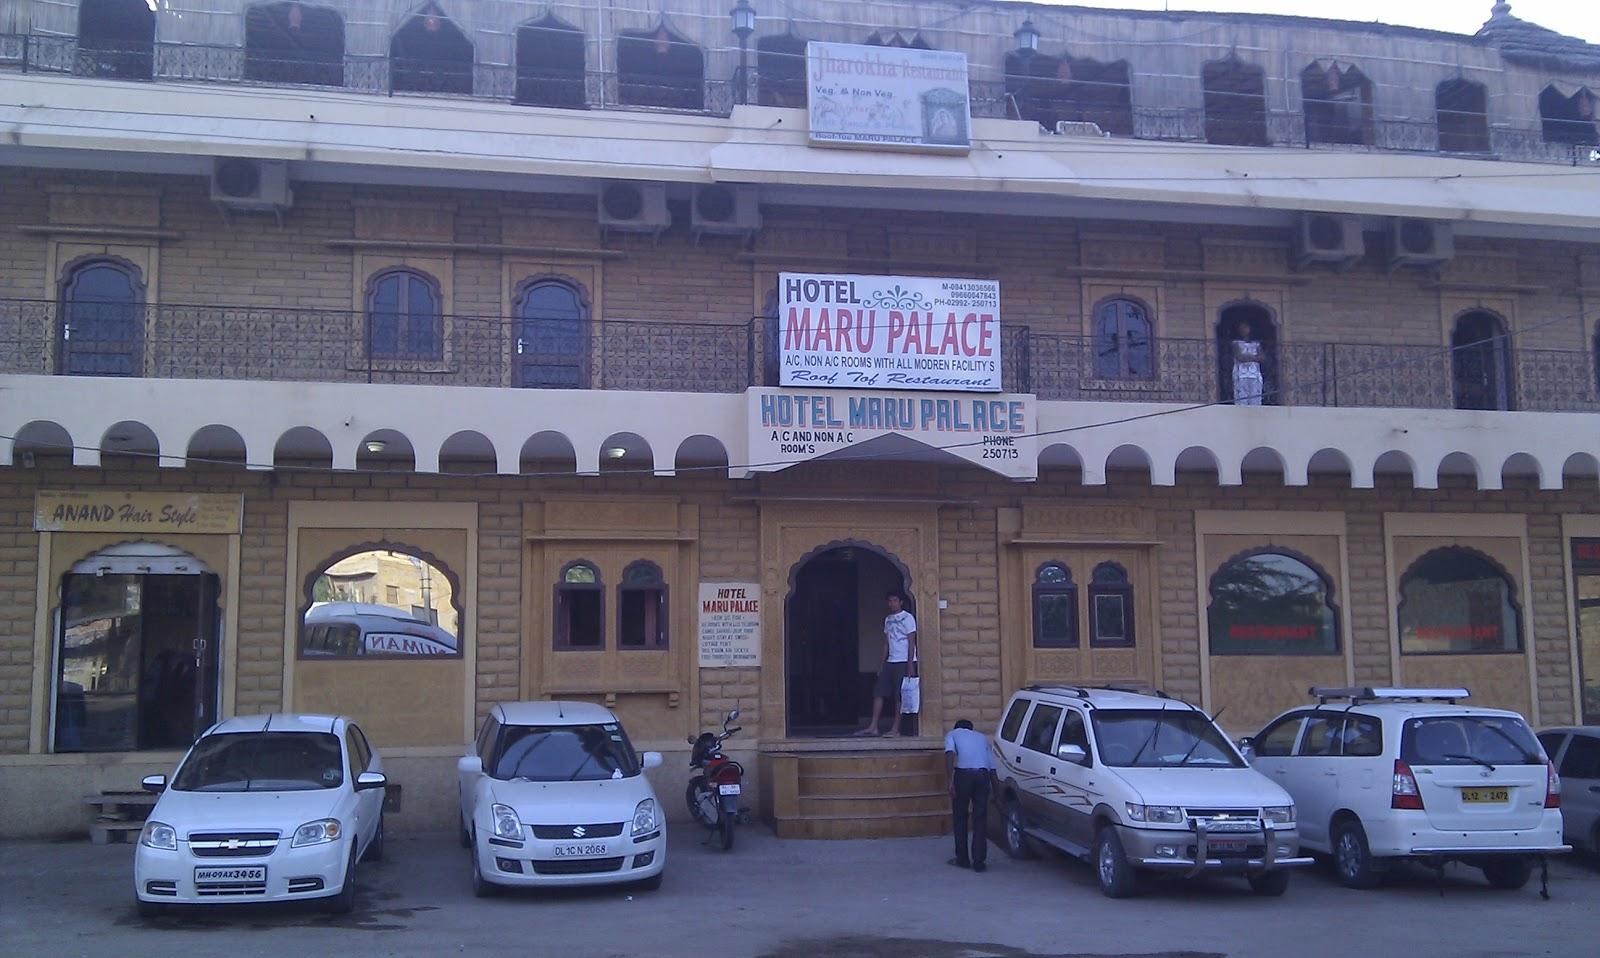 Hotel Maru Palace Fun Channel